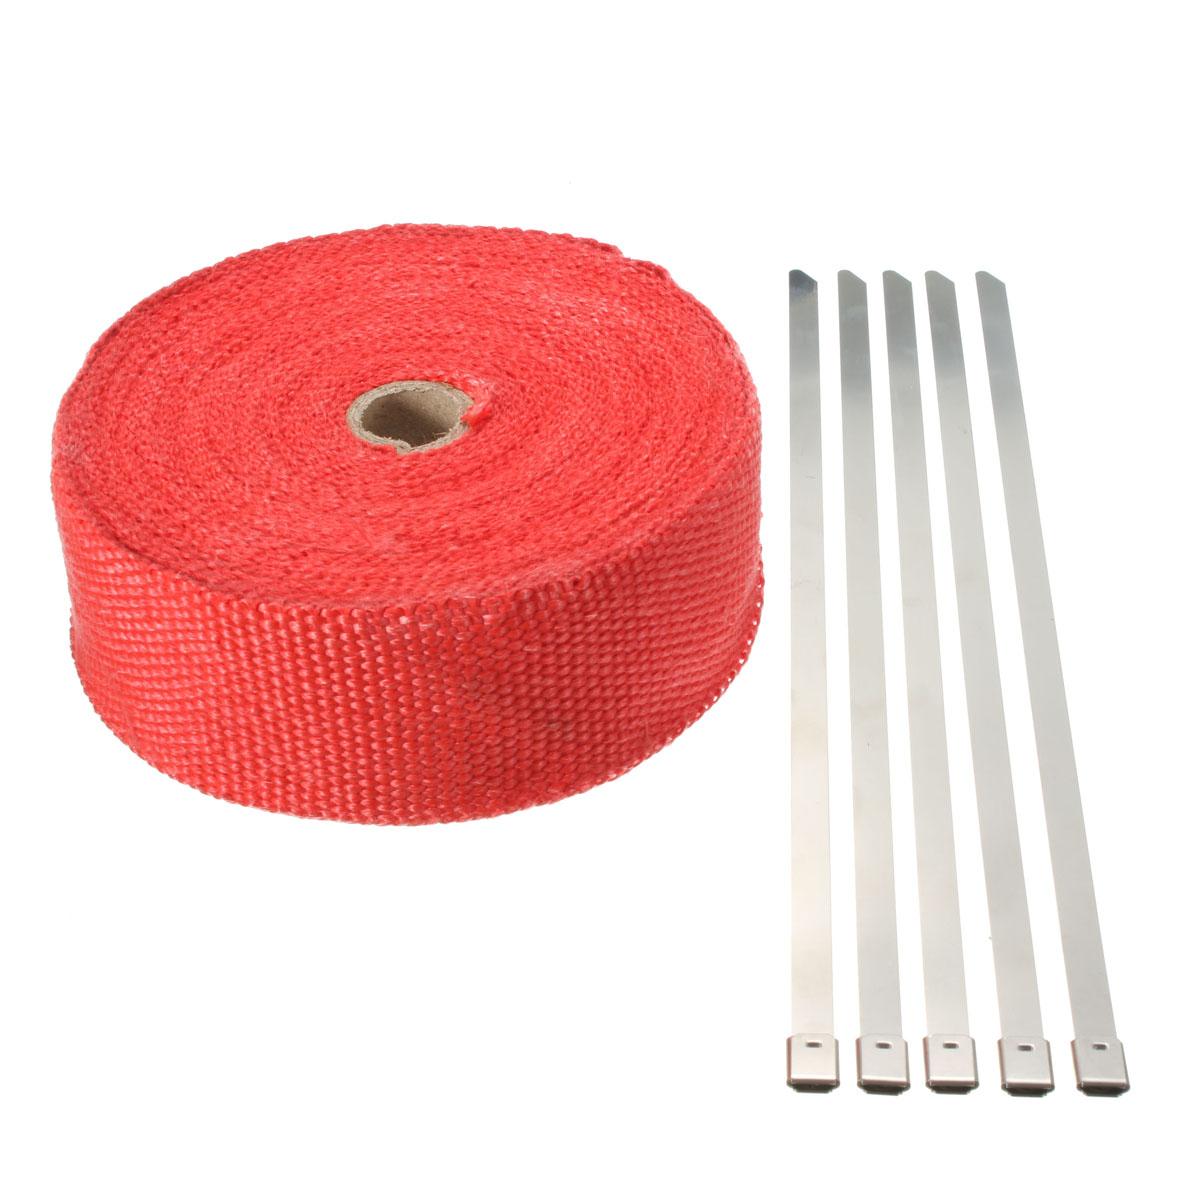 Buy 15M Red Exhaust Header Manifold Pipe Insulating Wrap Heat Tape + 5 Zip Tie